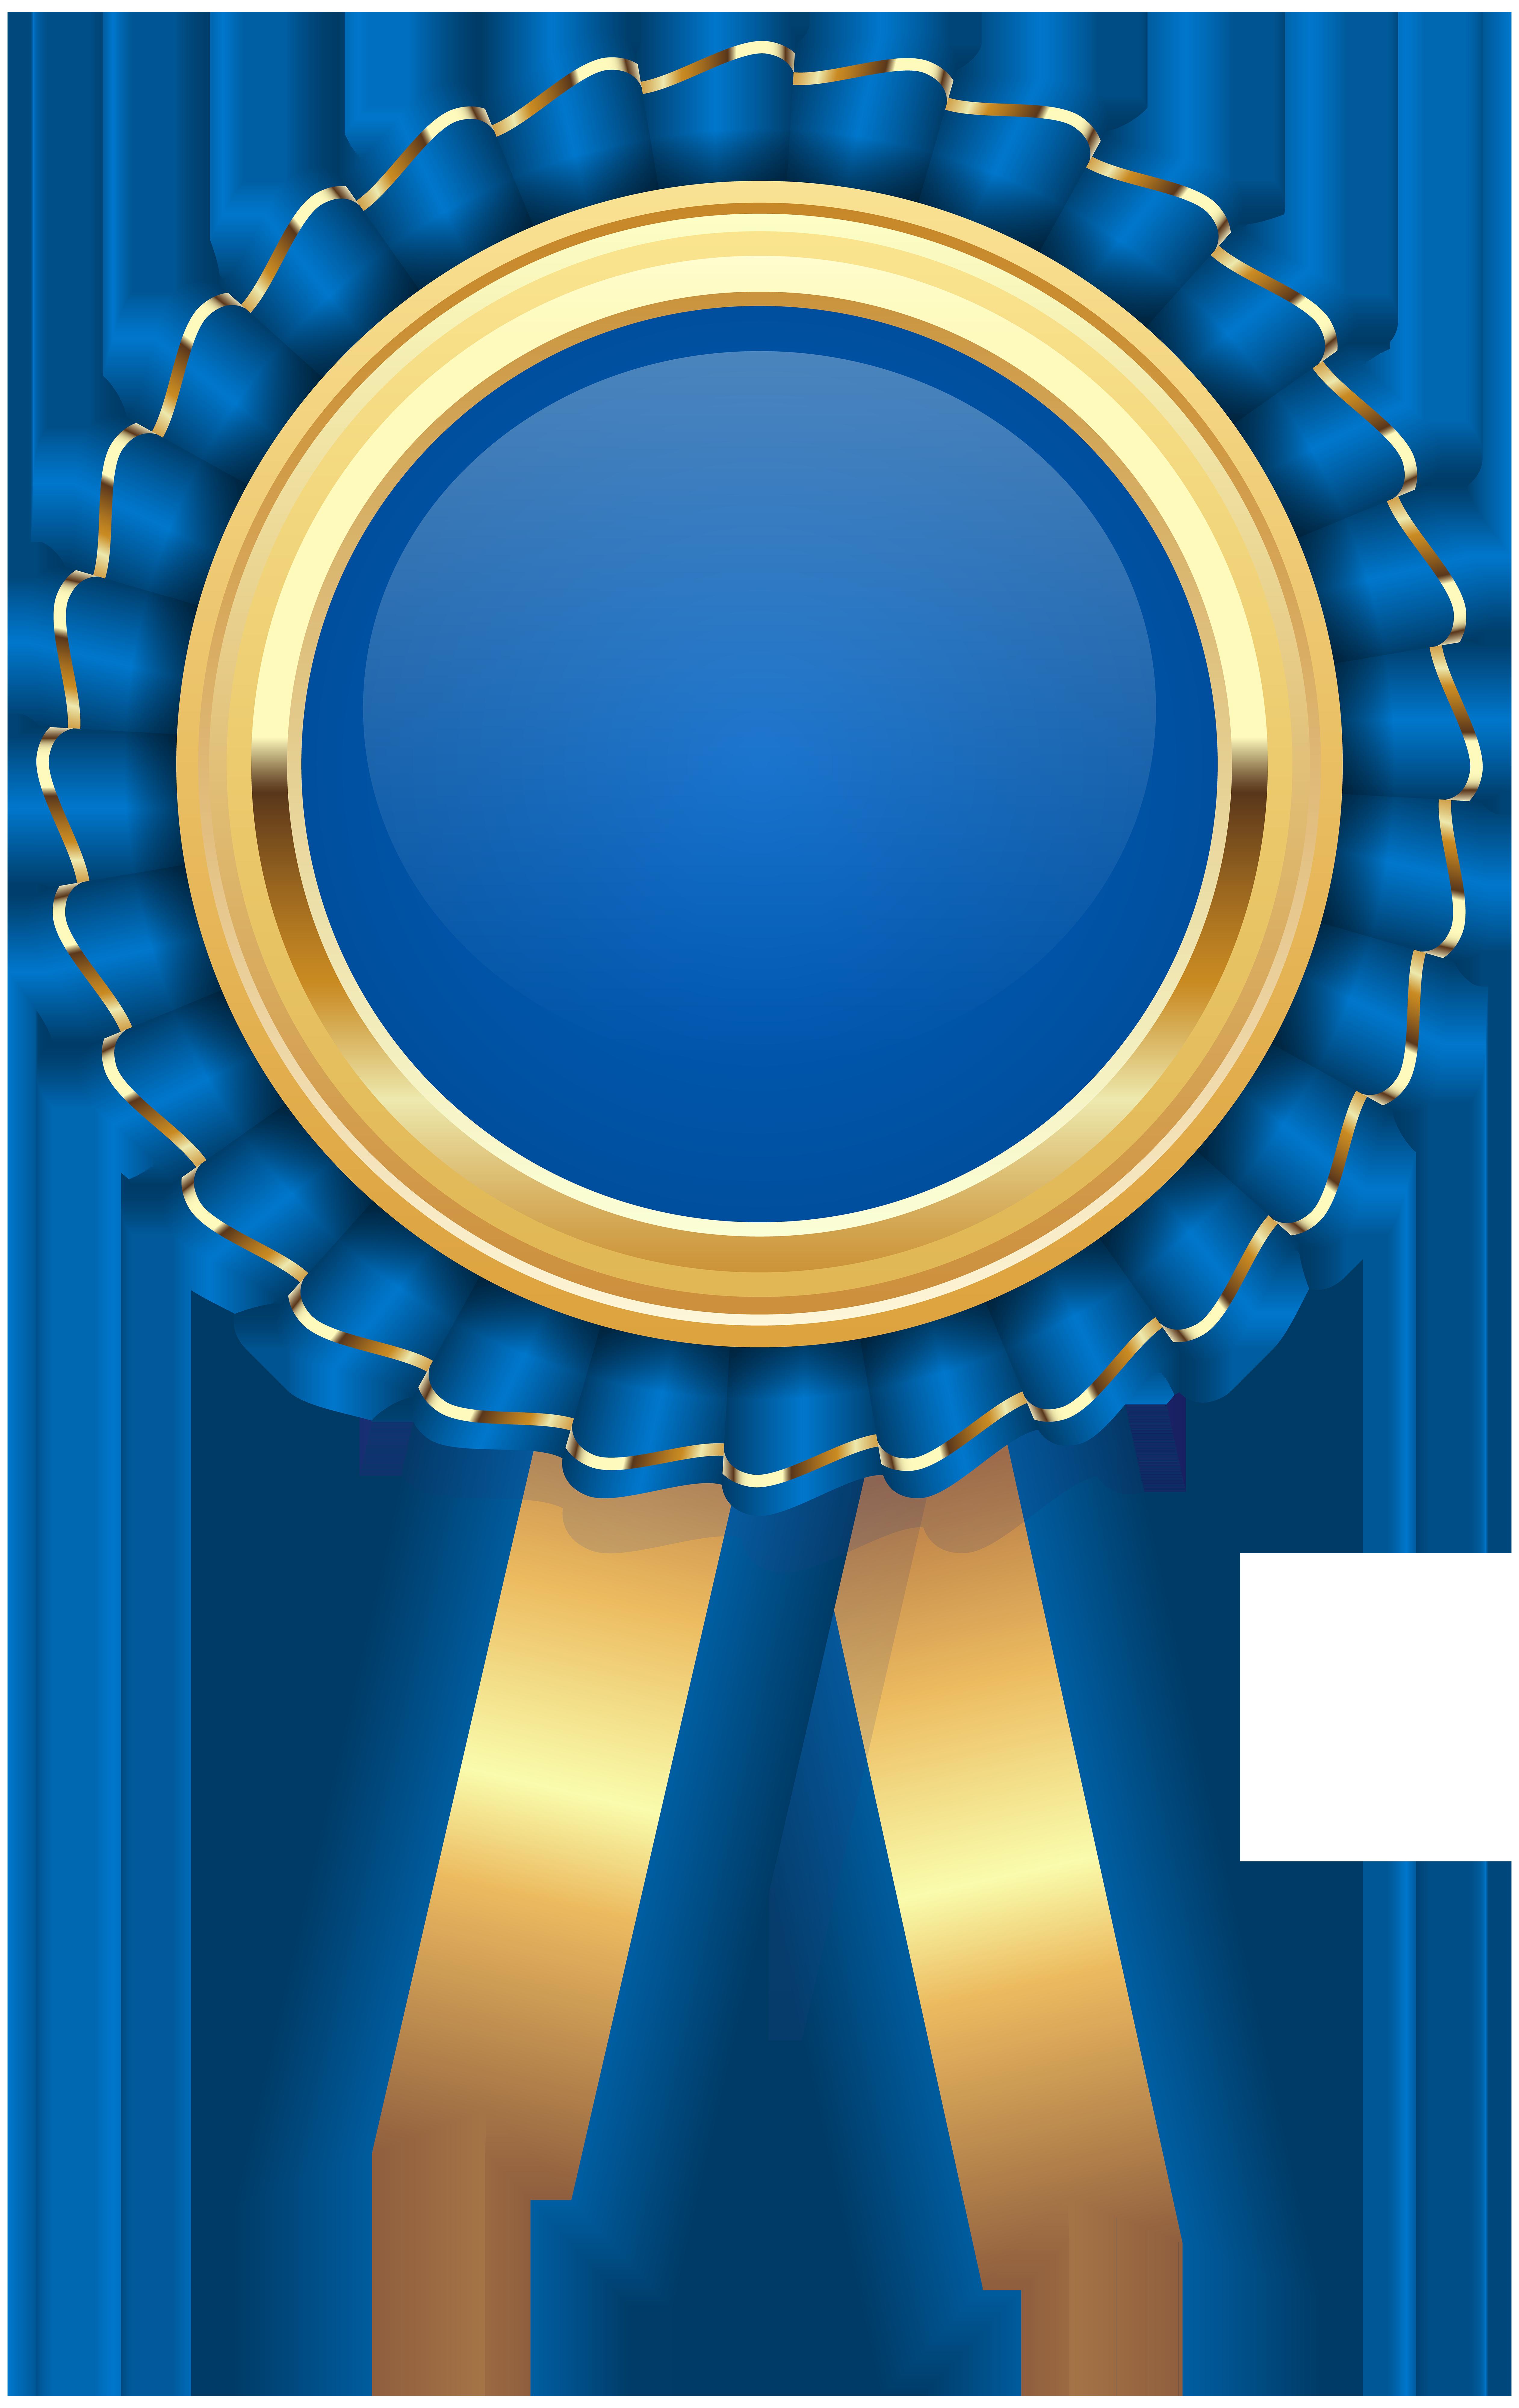 Blue Rosette PNG Clip Art Image.